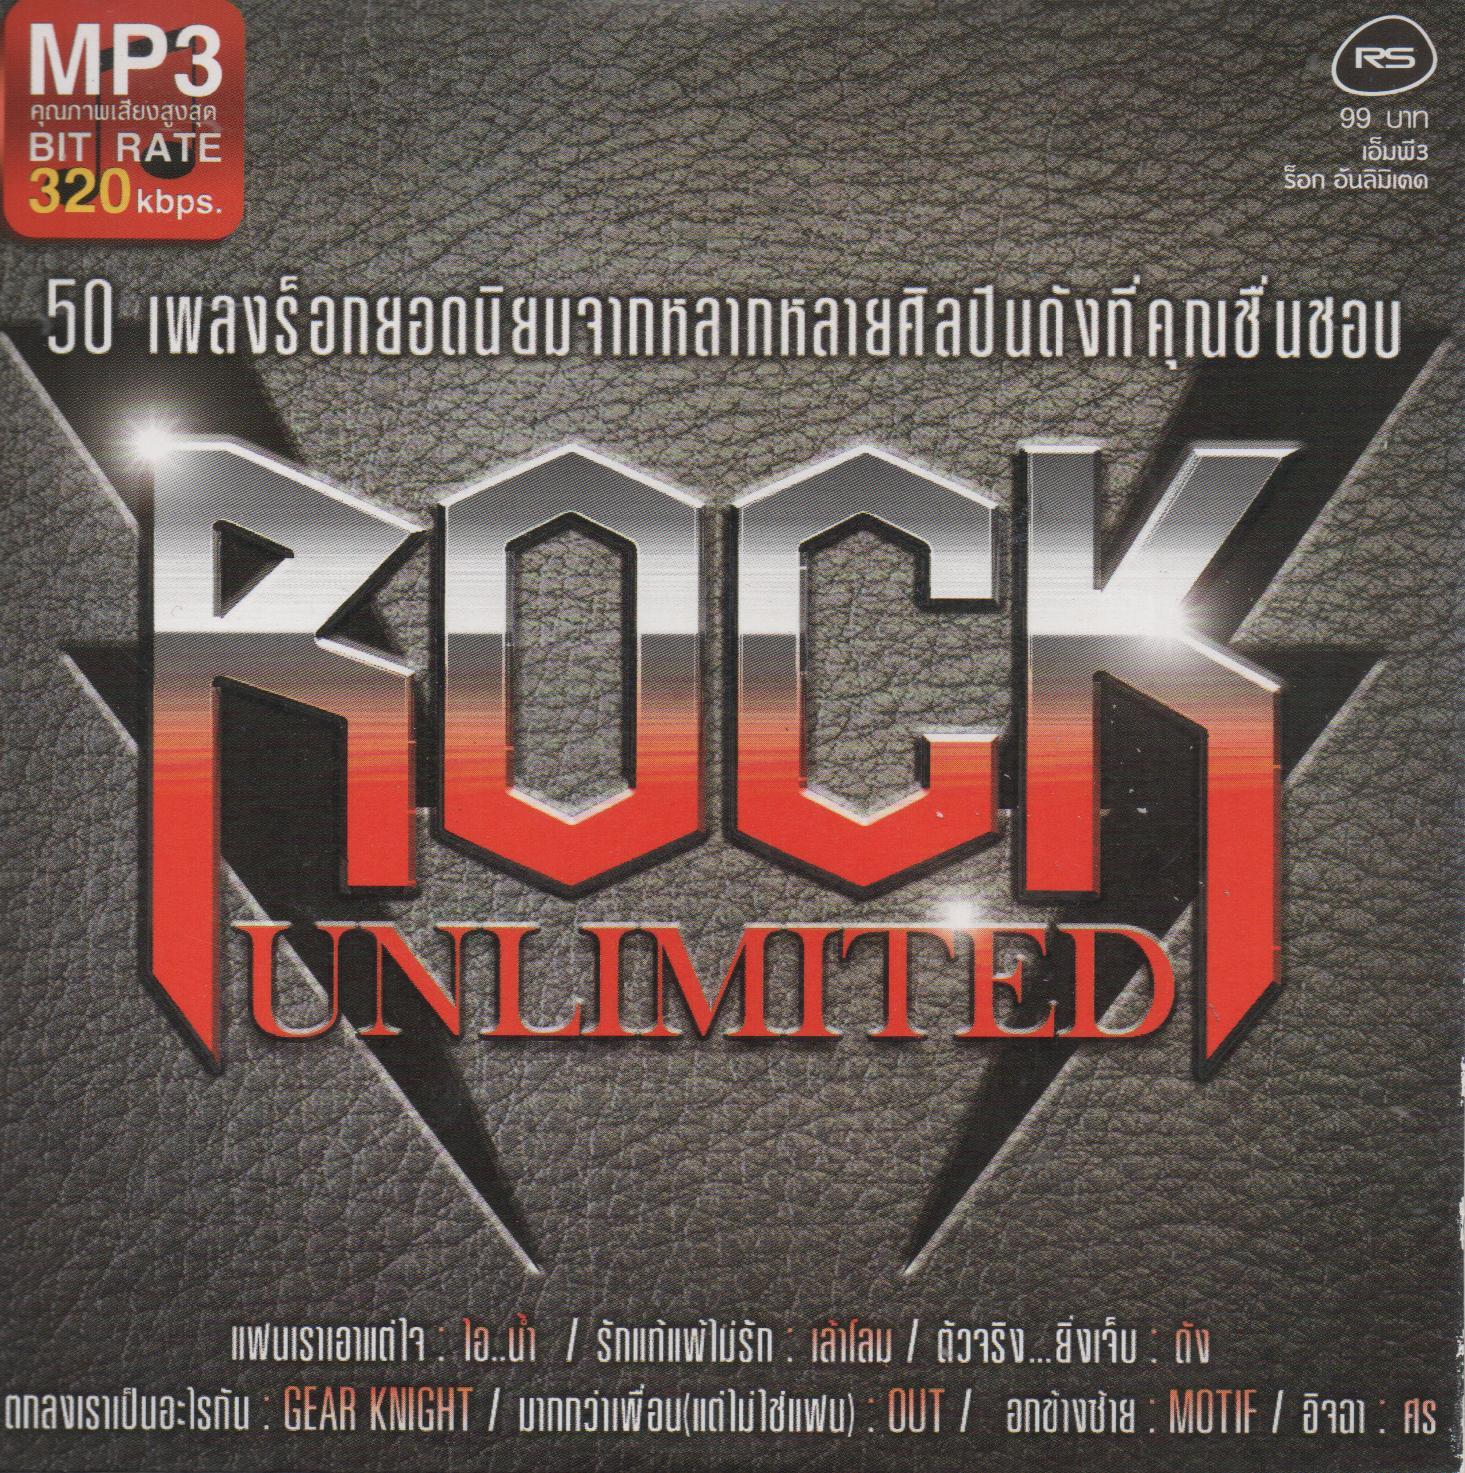 Download [Mp3]-[Hit Music] 50 เพลงร็อกยอดนิยมจากหลากหลายศิลปินดังที่คุณชื่นชอบ ในชุด Rock Unlimited @320kbps 4shared By Pleng-mun.com